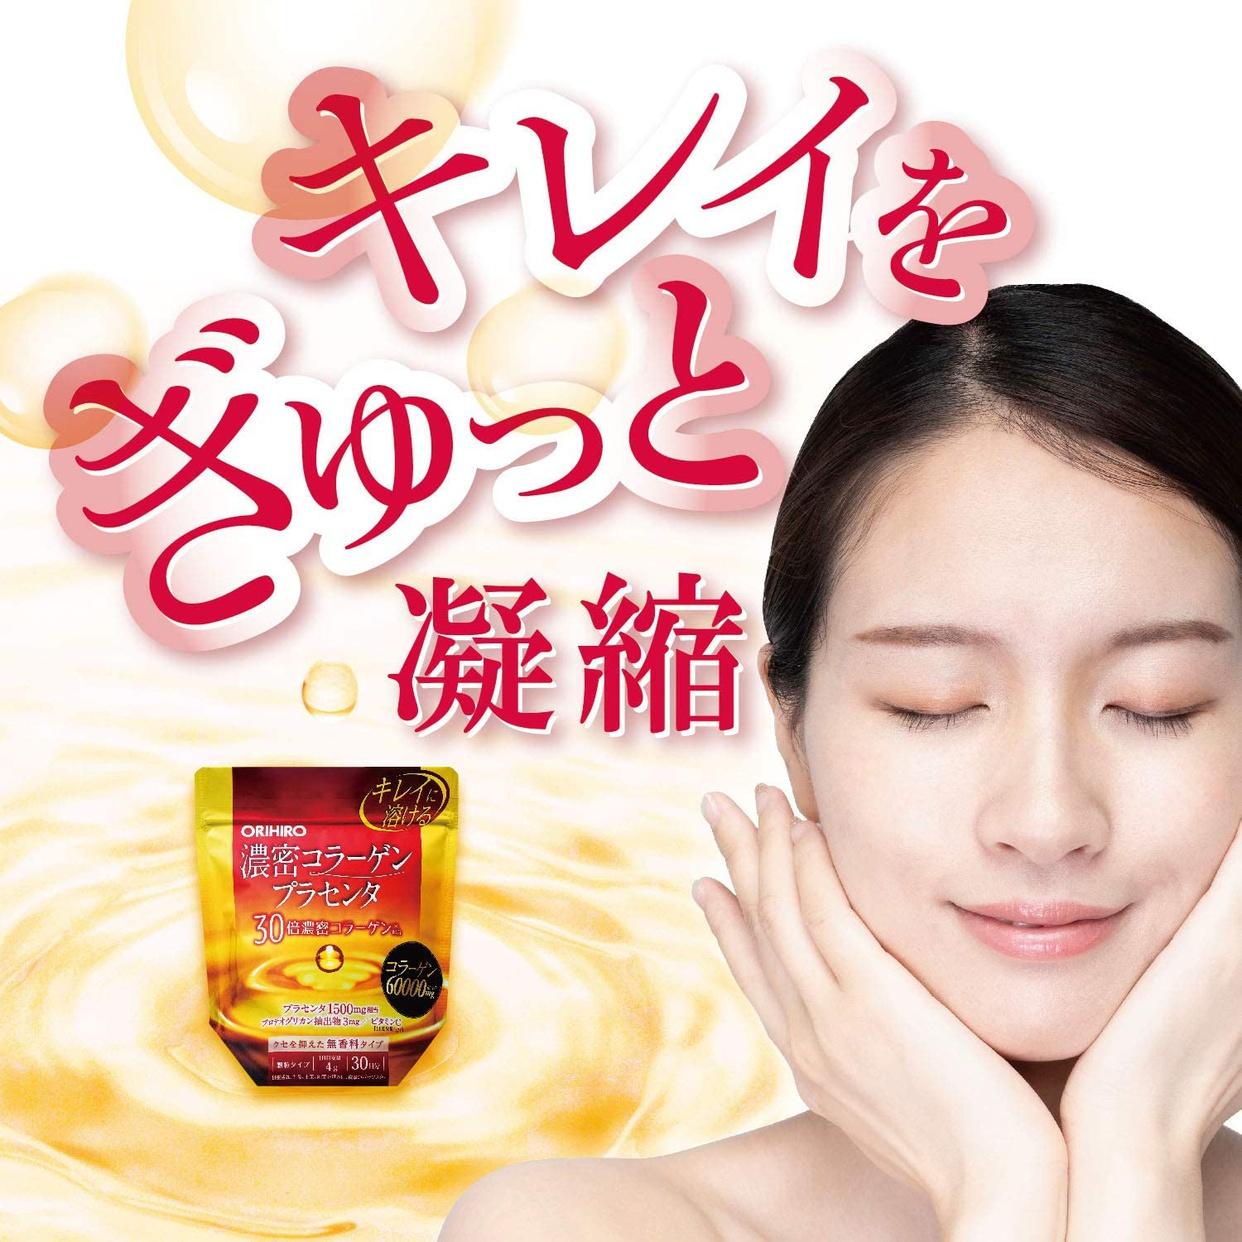 ORIHIRO(オリヒロ) 濃密コラーゲンプラセンタの商品画像3